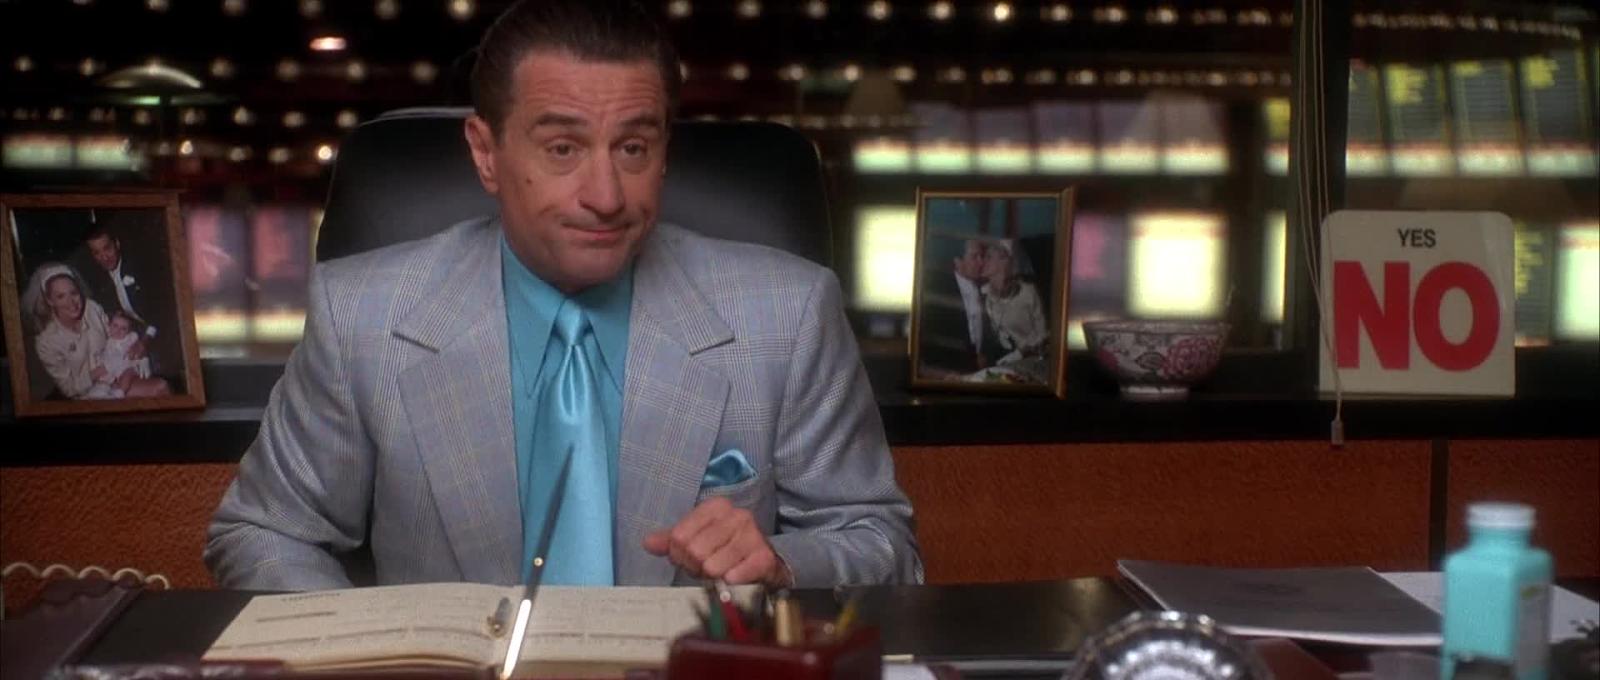 Casino 1995 Director